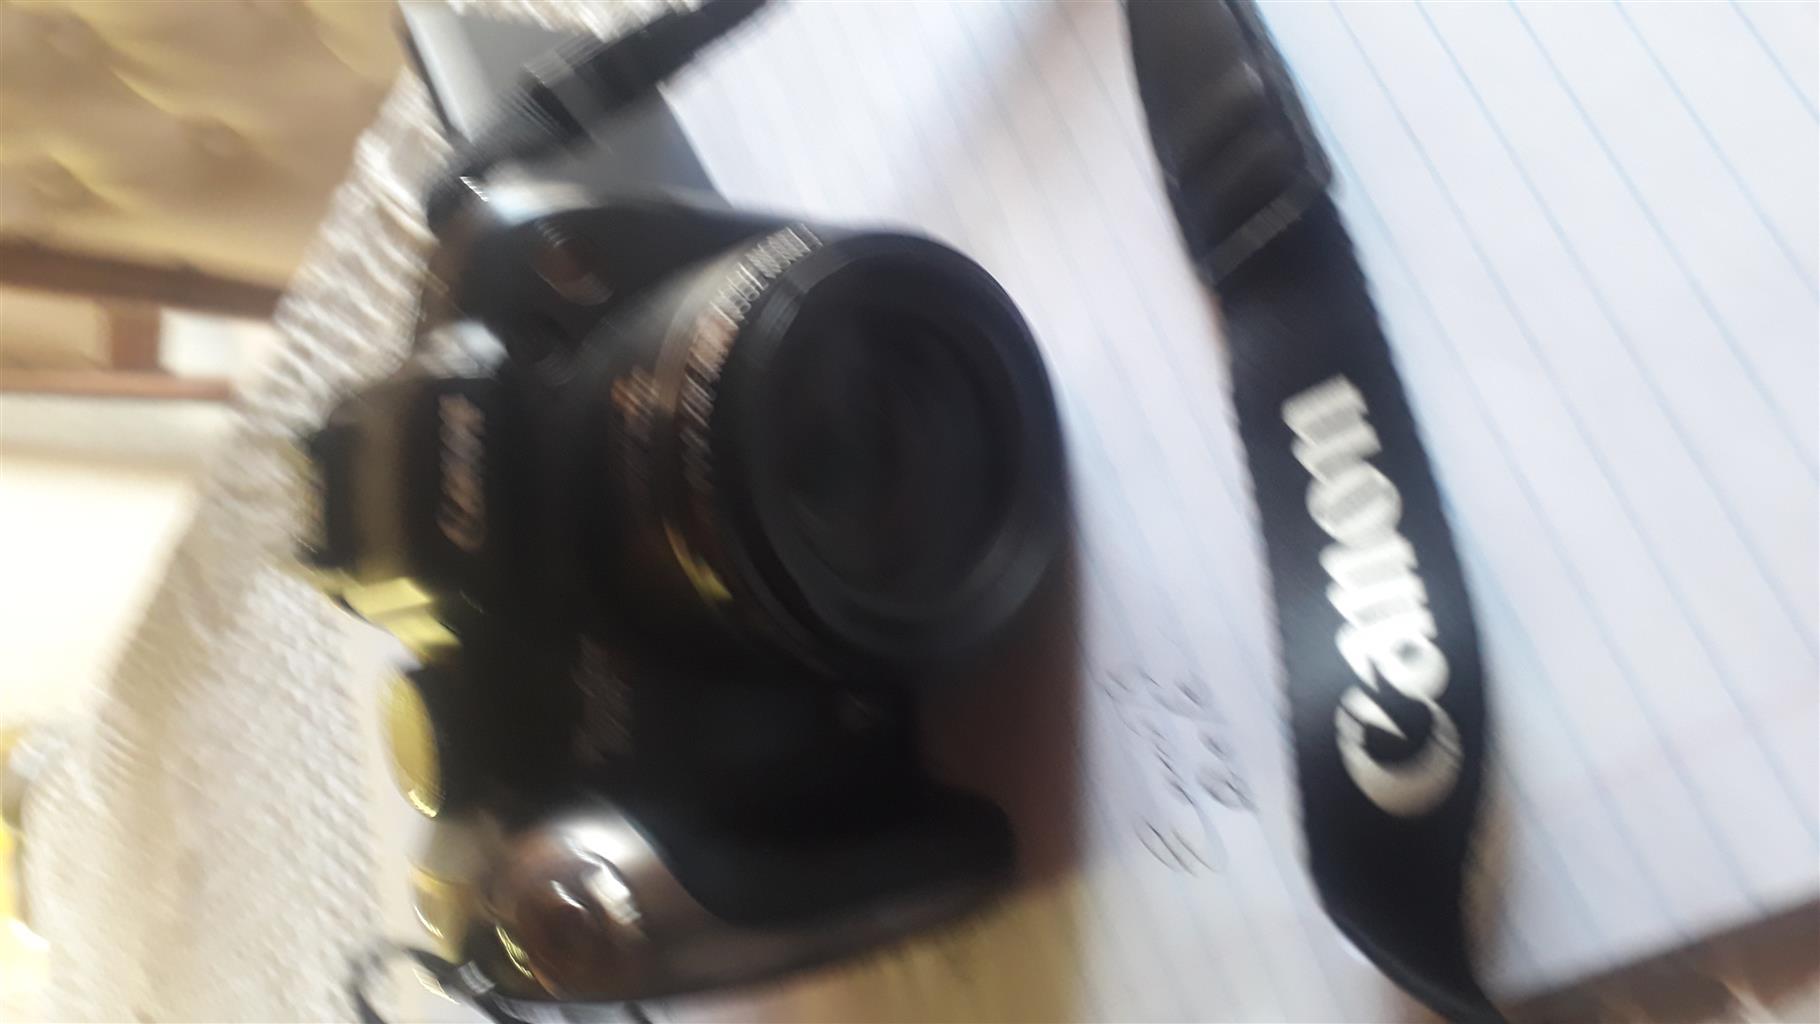 Canon Power Shot. Image stabilizer